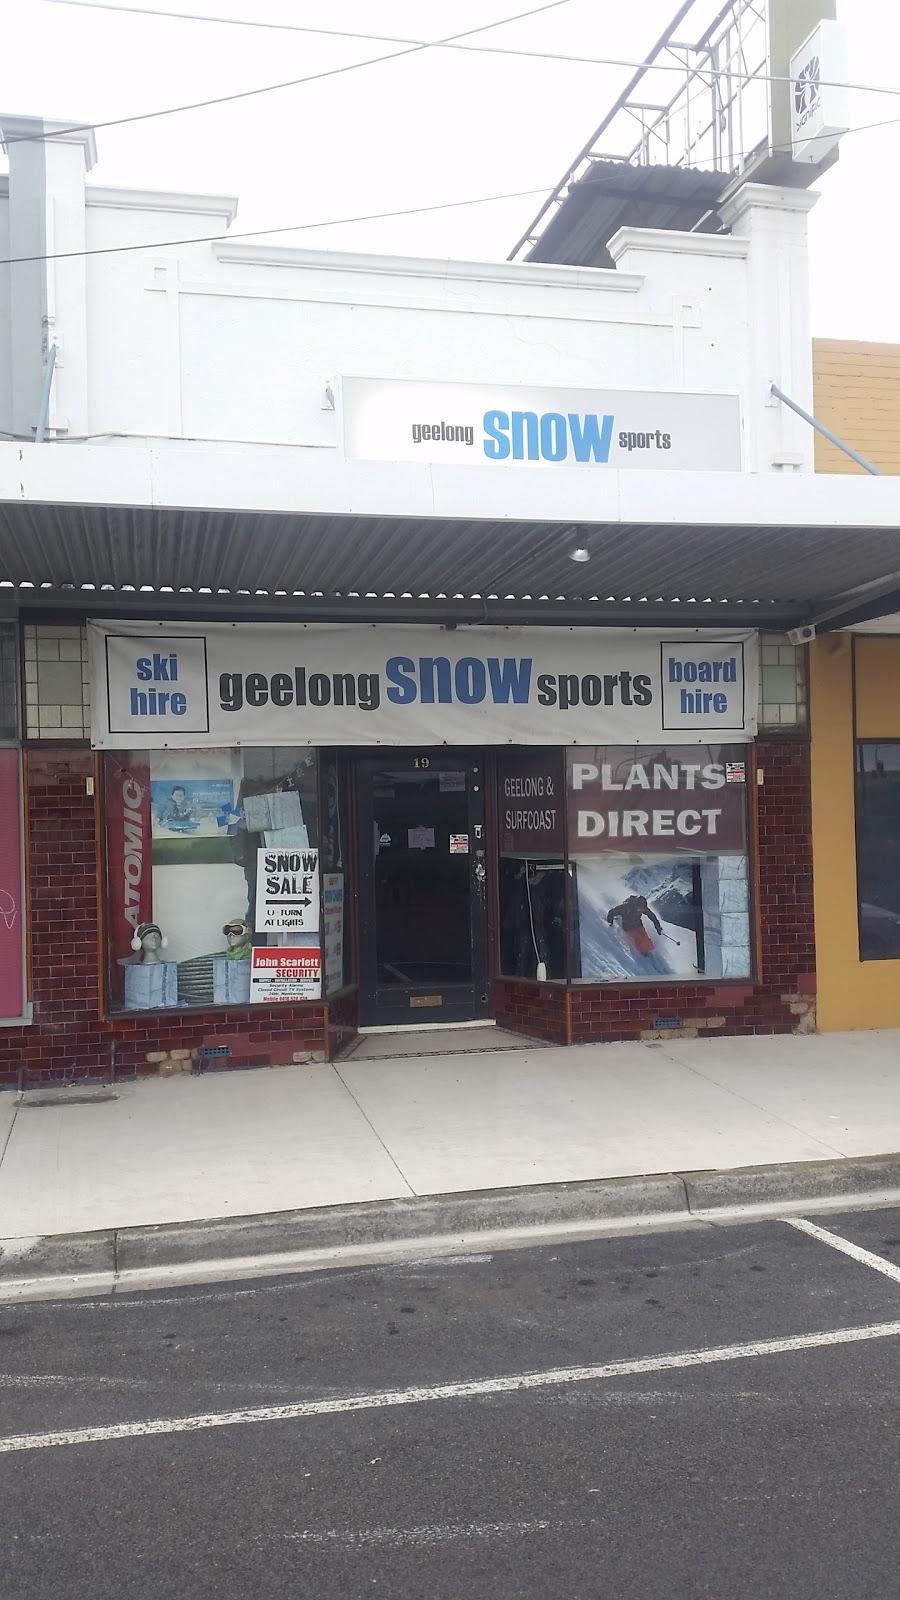 Snow Shack Snowsports Geelong | store | 65/67 Mercer St, Geelong VIC 3220, Australia | 0408902659 OR +61 408 902 659